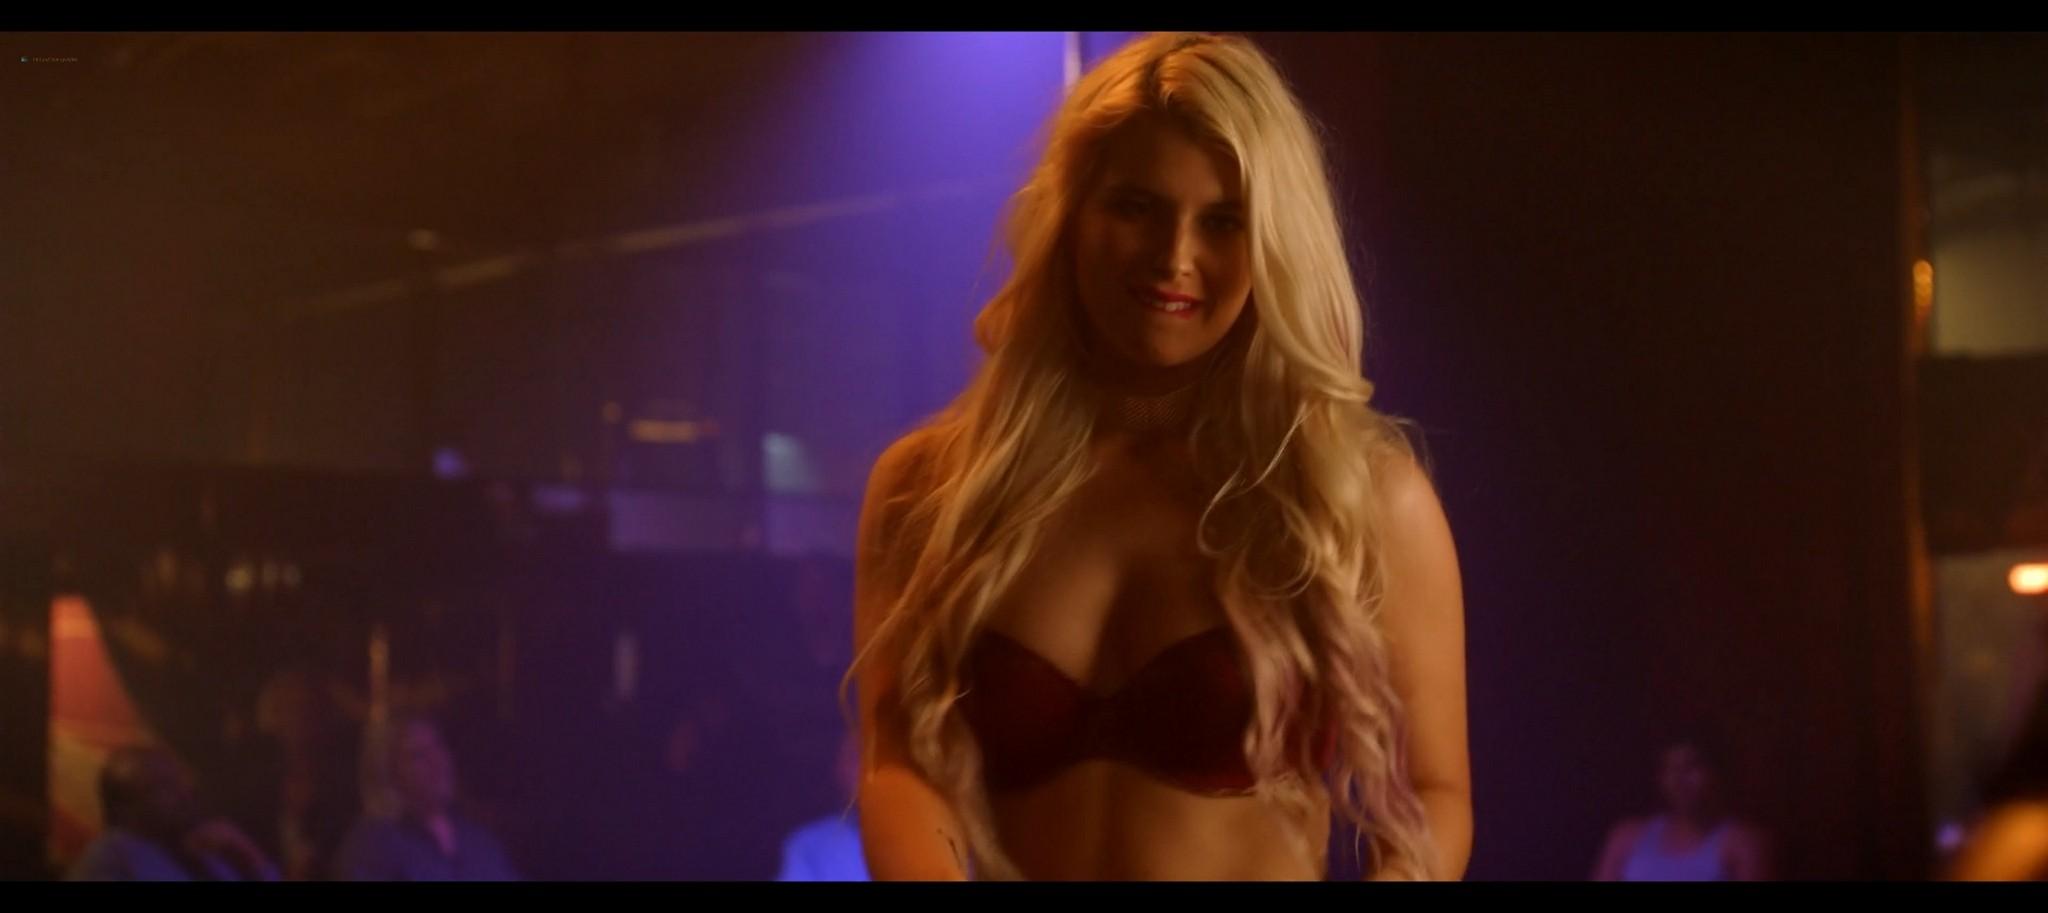 Kenzie Dalton hot Drue Knapp Ava Locklear sexy A Dark Foe 2021 1080p Web 2